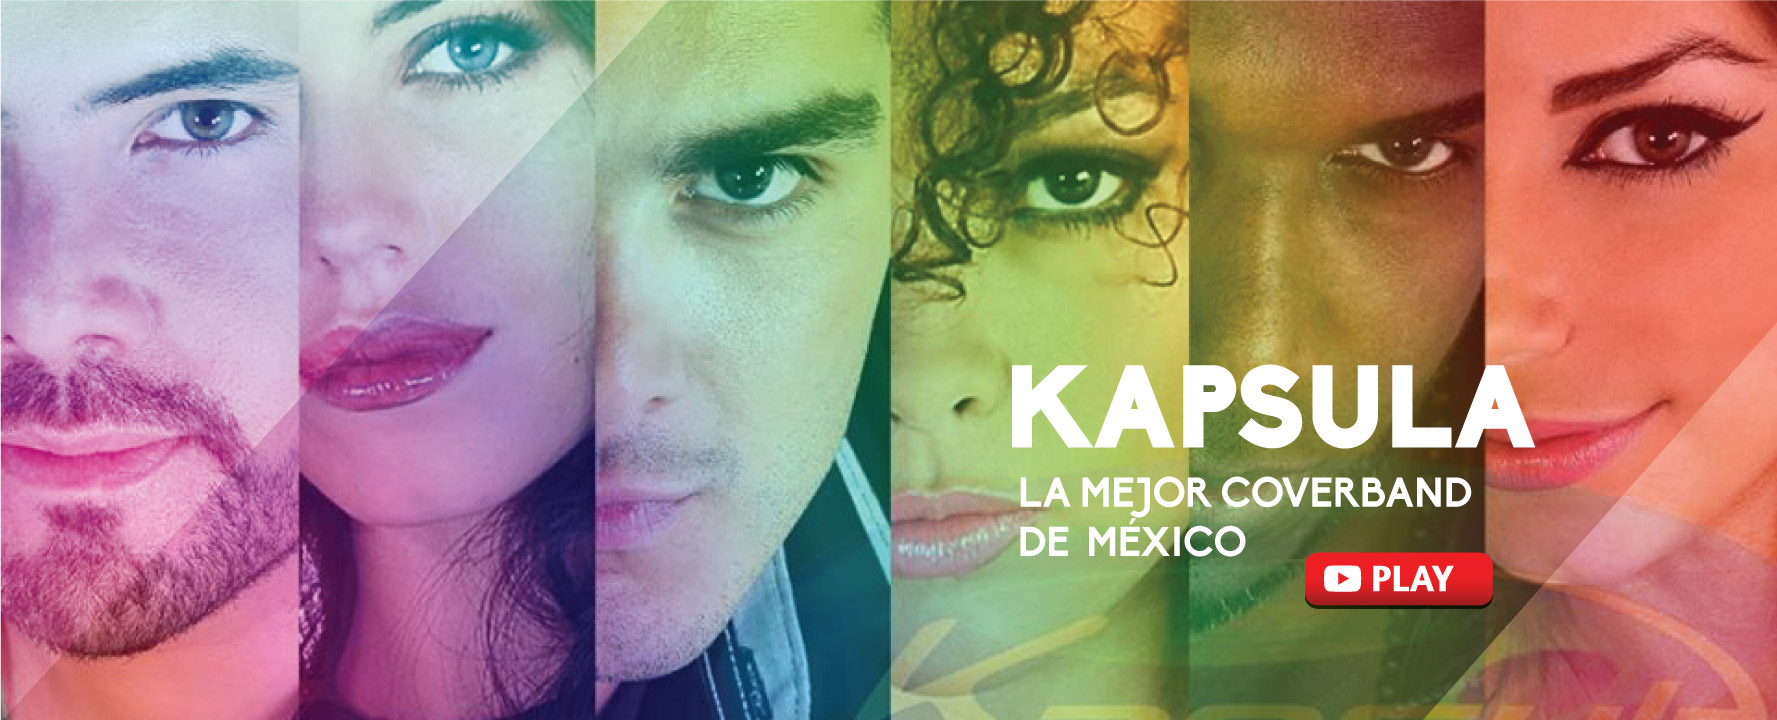 Kapsula, la mejor coverband de México